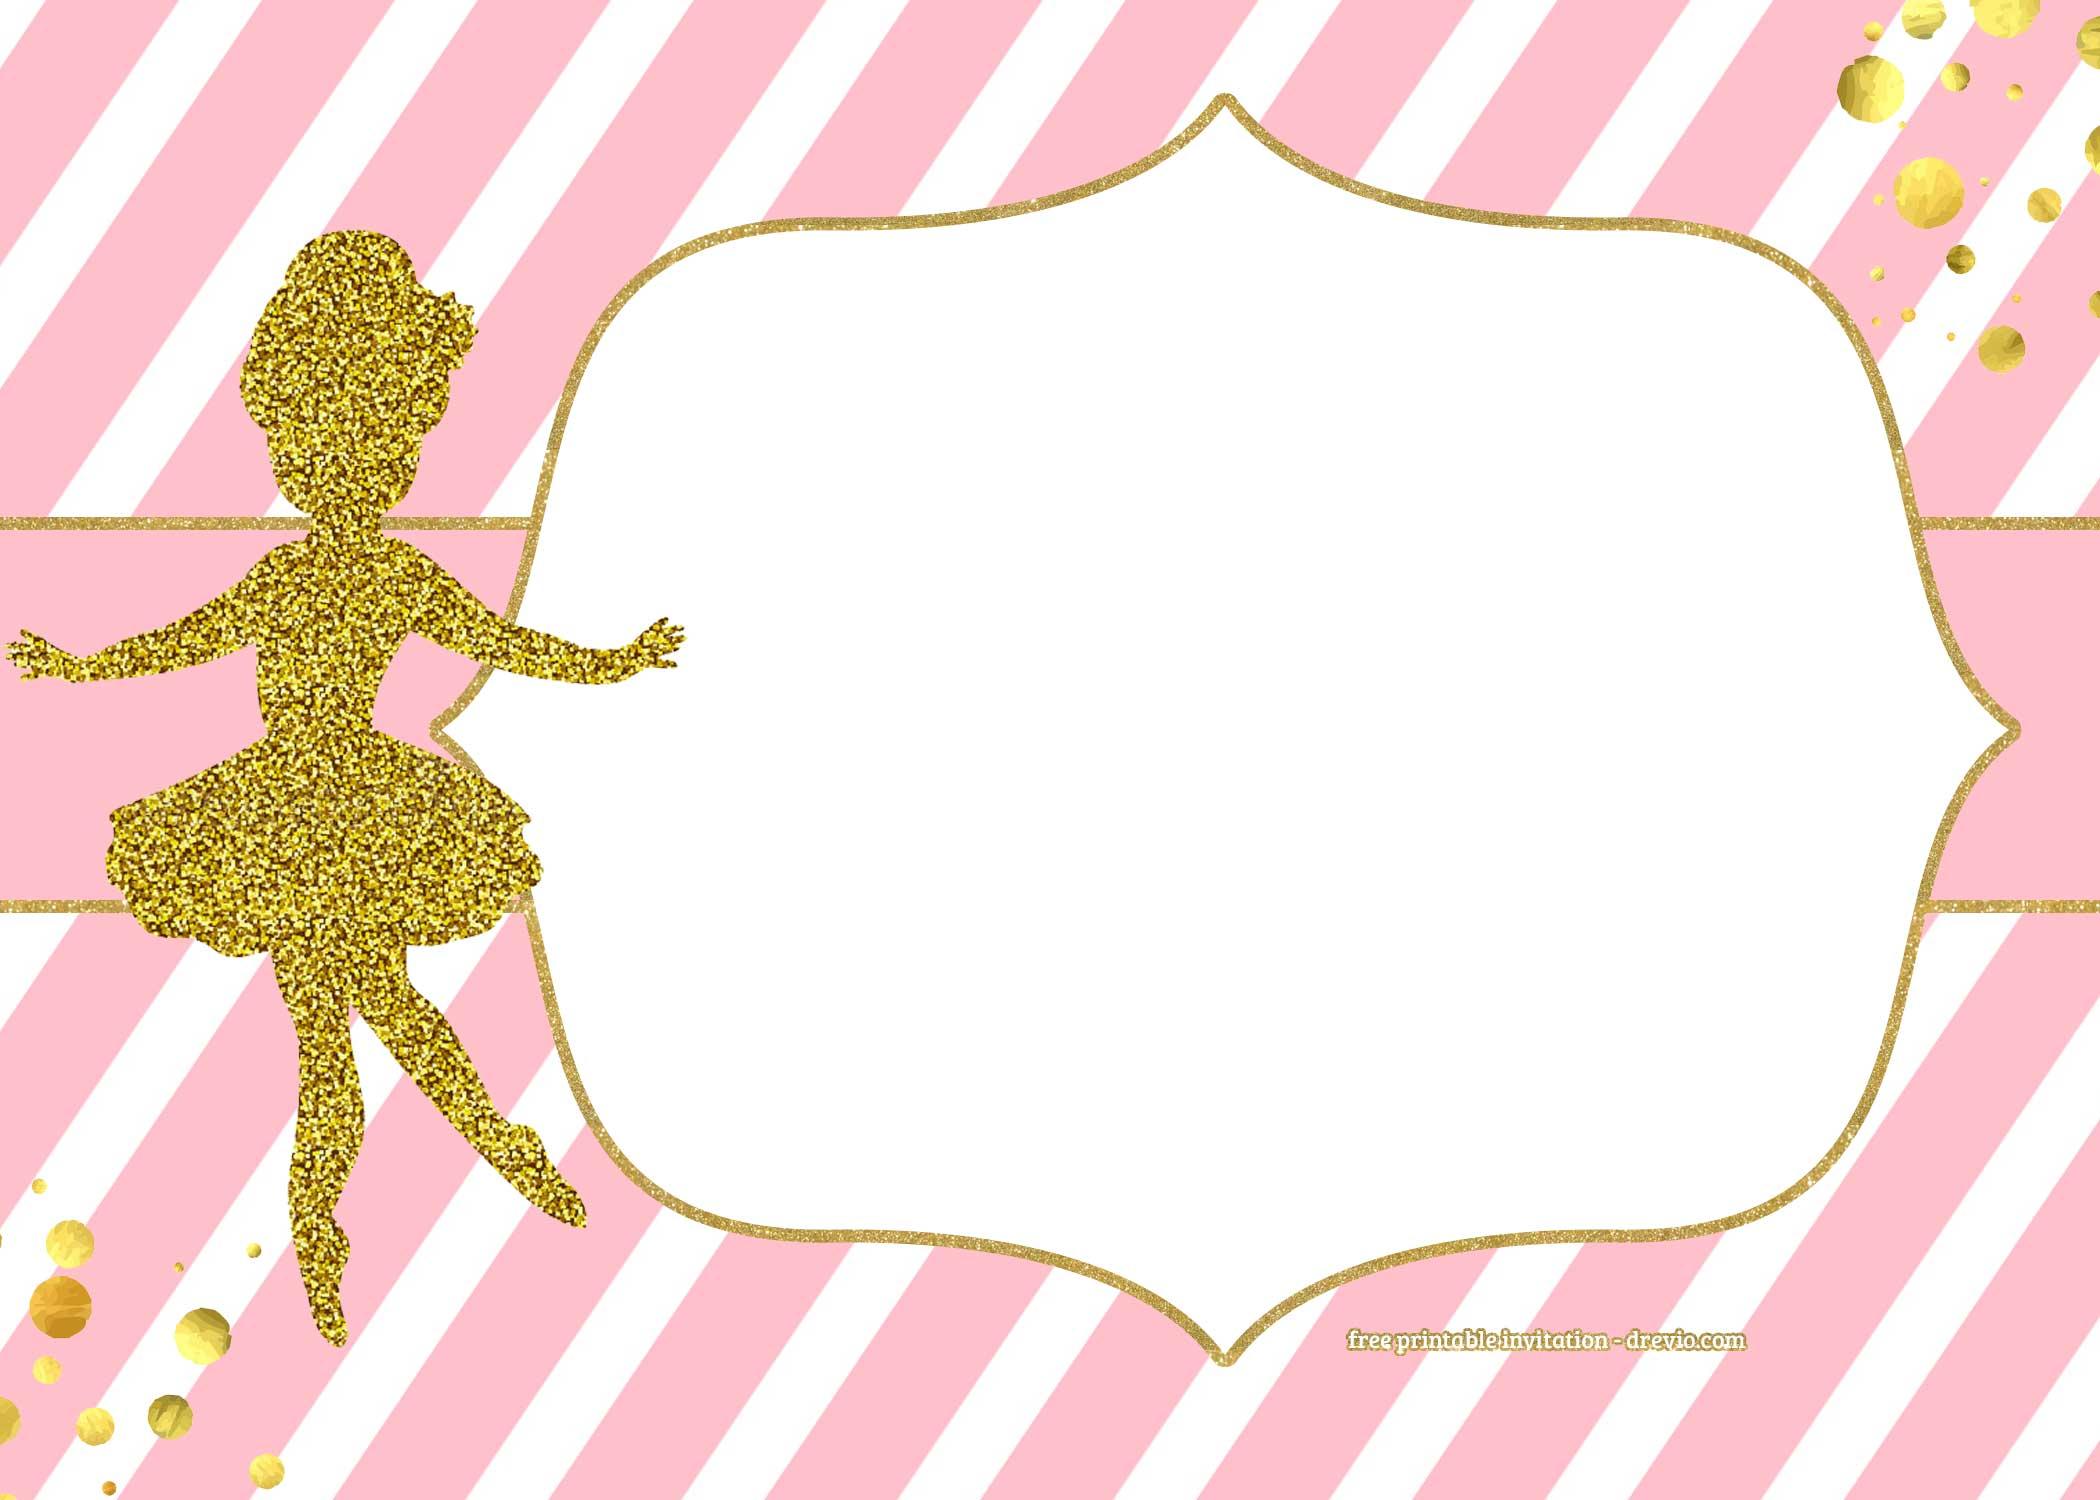 FREE Golden Ballerina Birthday Invitation Templates FREE Invitation Templates Drevio